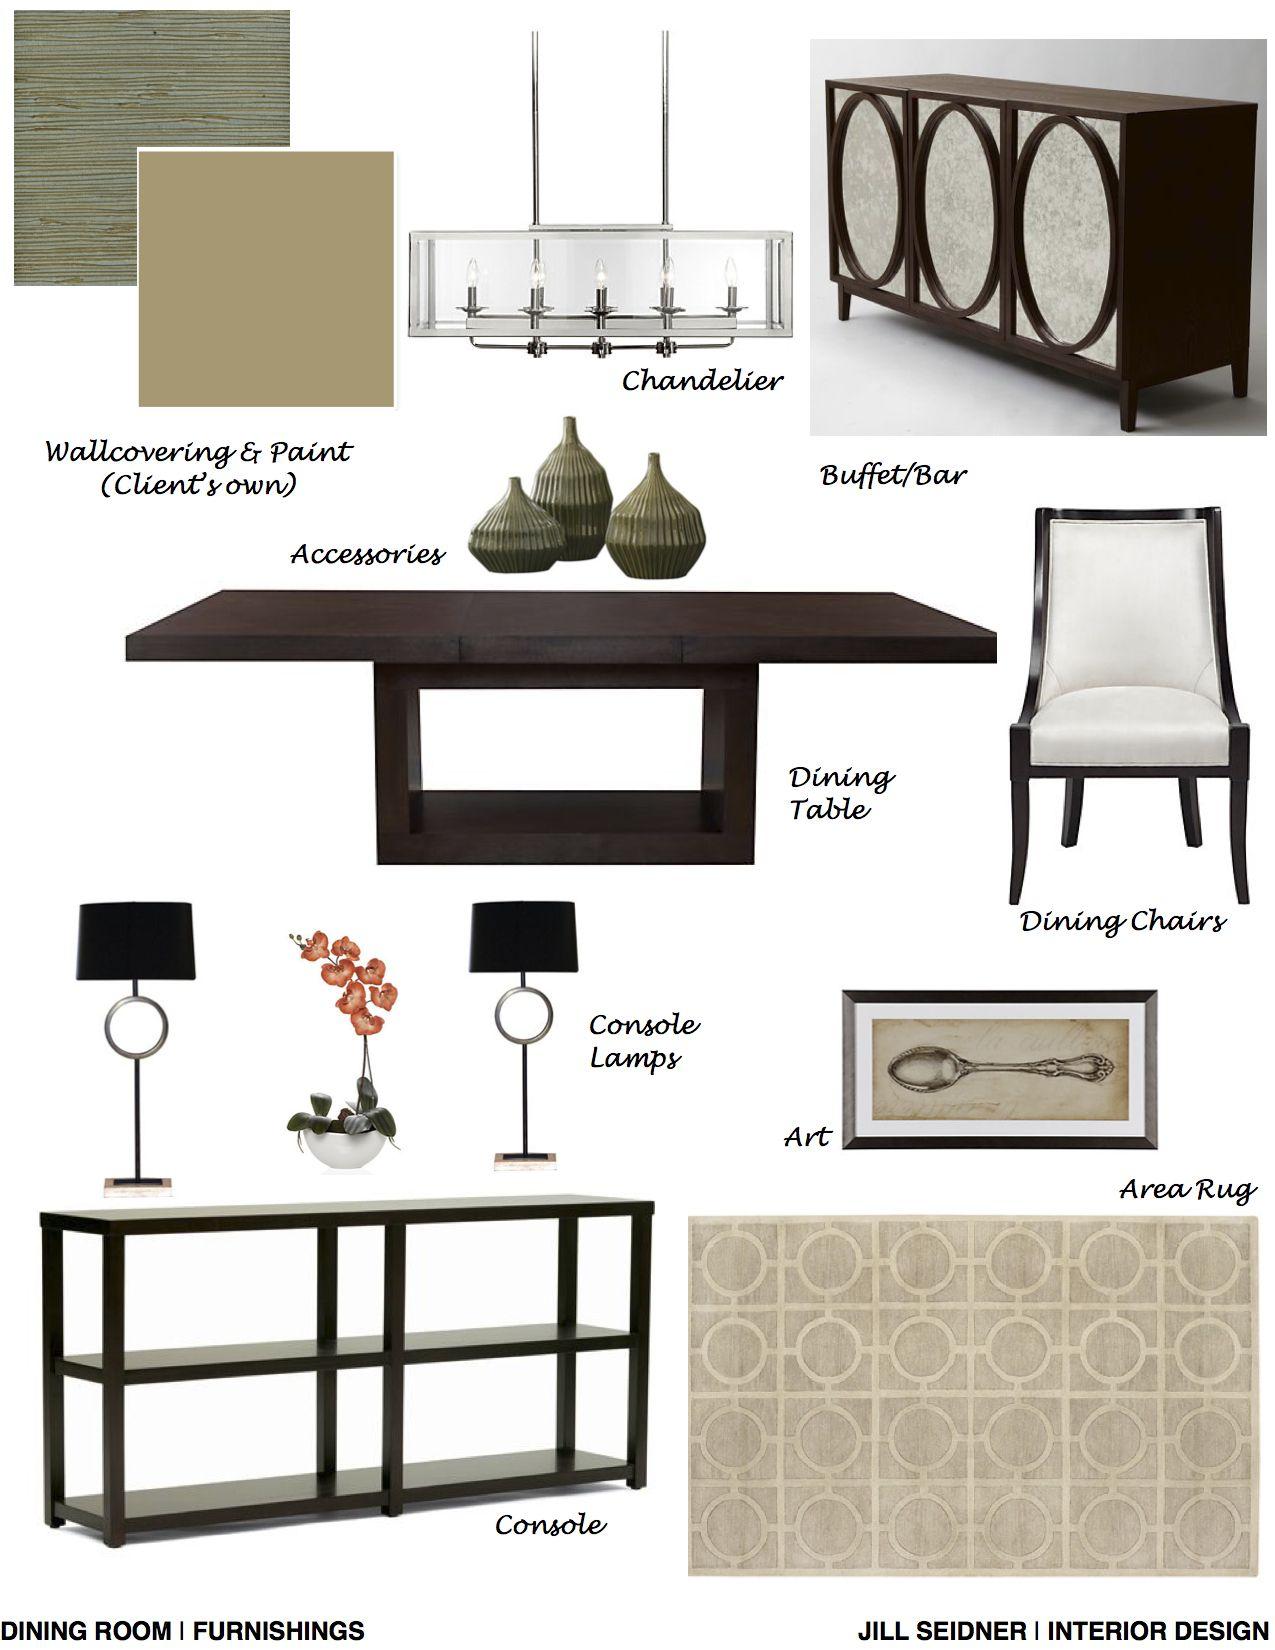 Katy TX Online Design Project Dining Room Furnishings Concept Board JSInteriorDesBlogspot